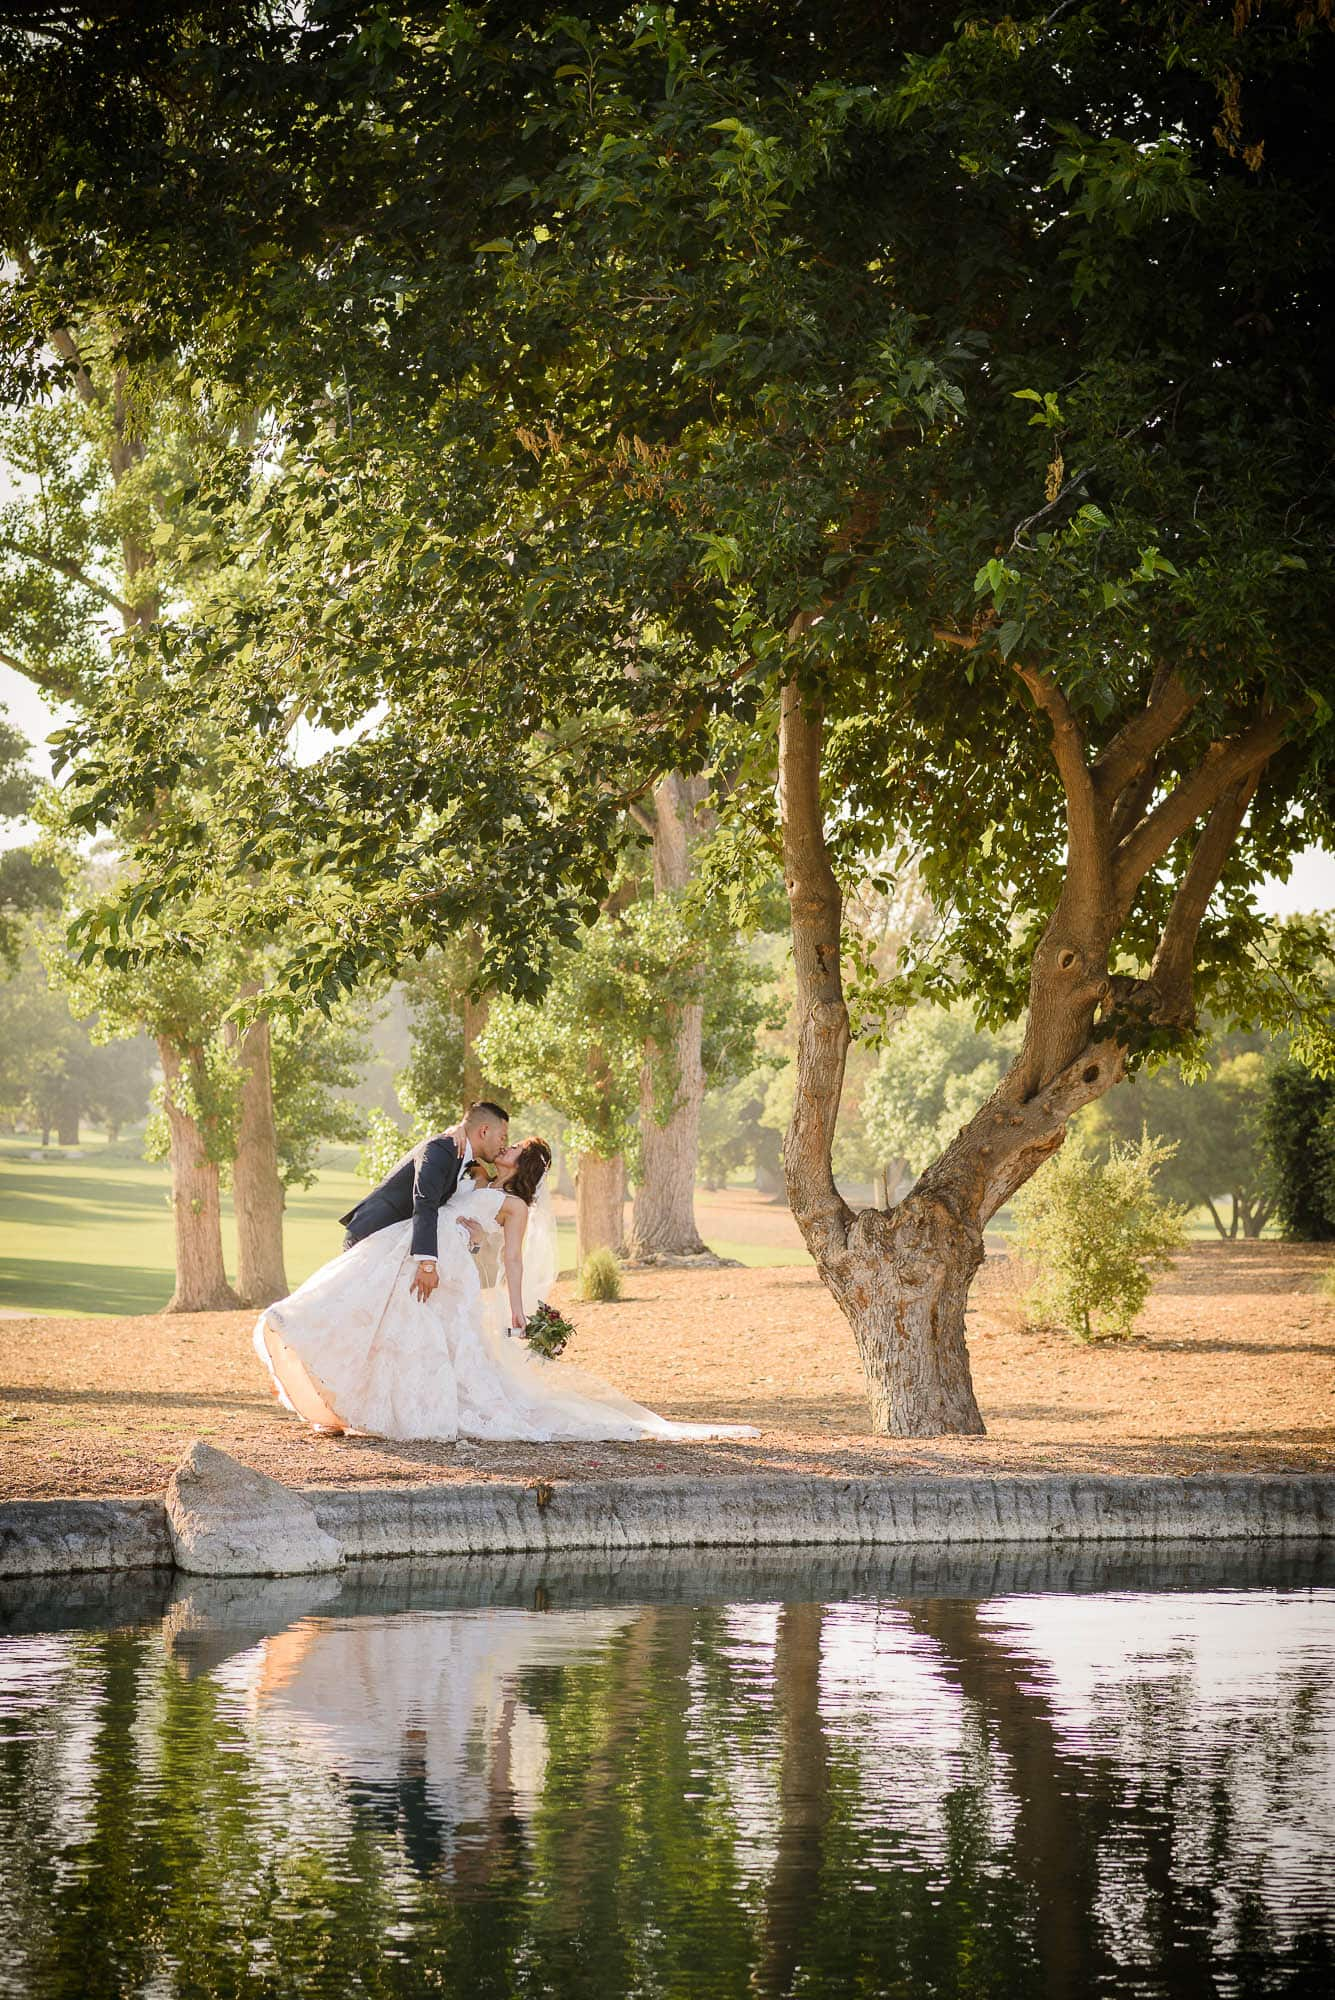 028_Alan_and_Heidi_Wedding_Karla_Paolo